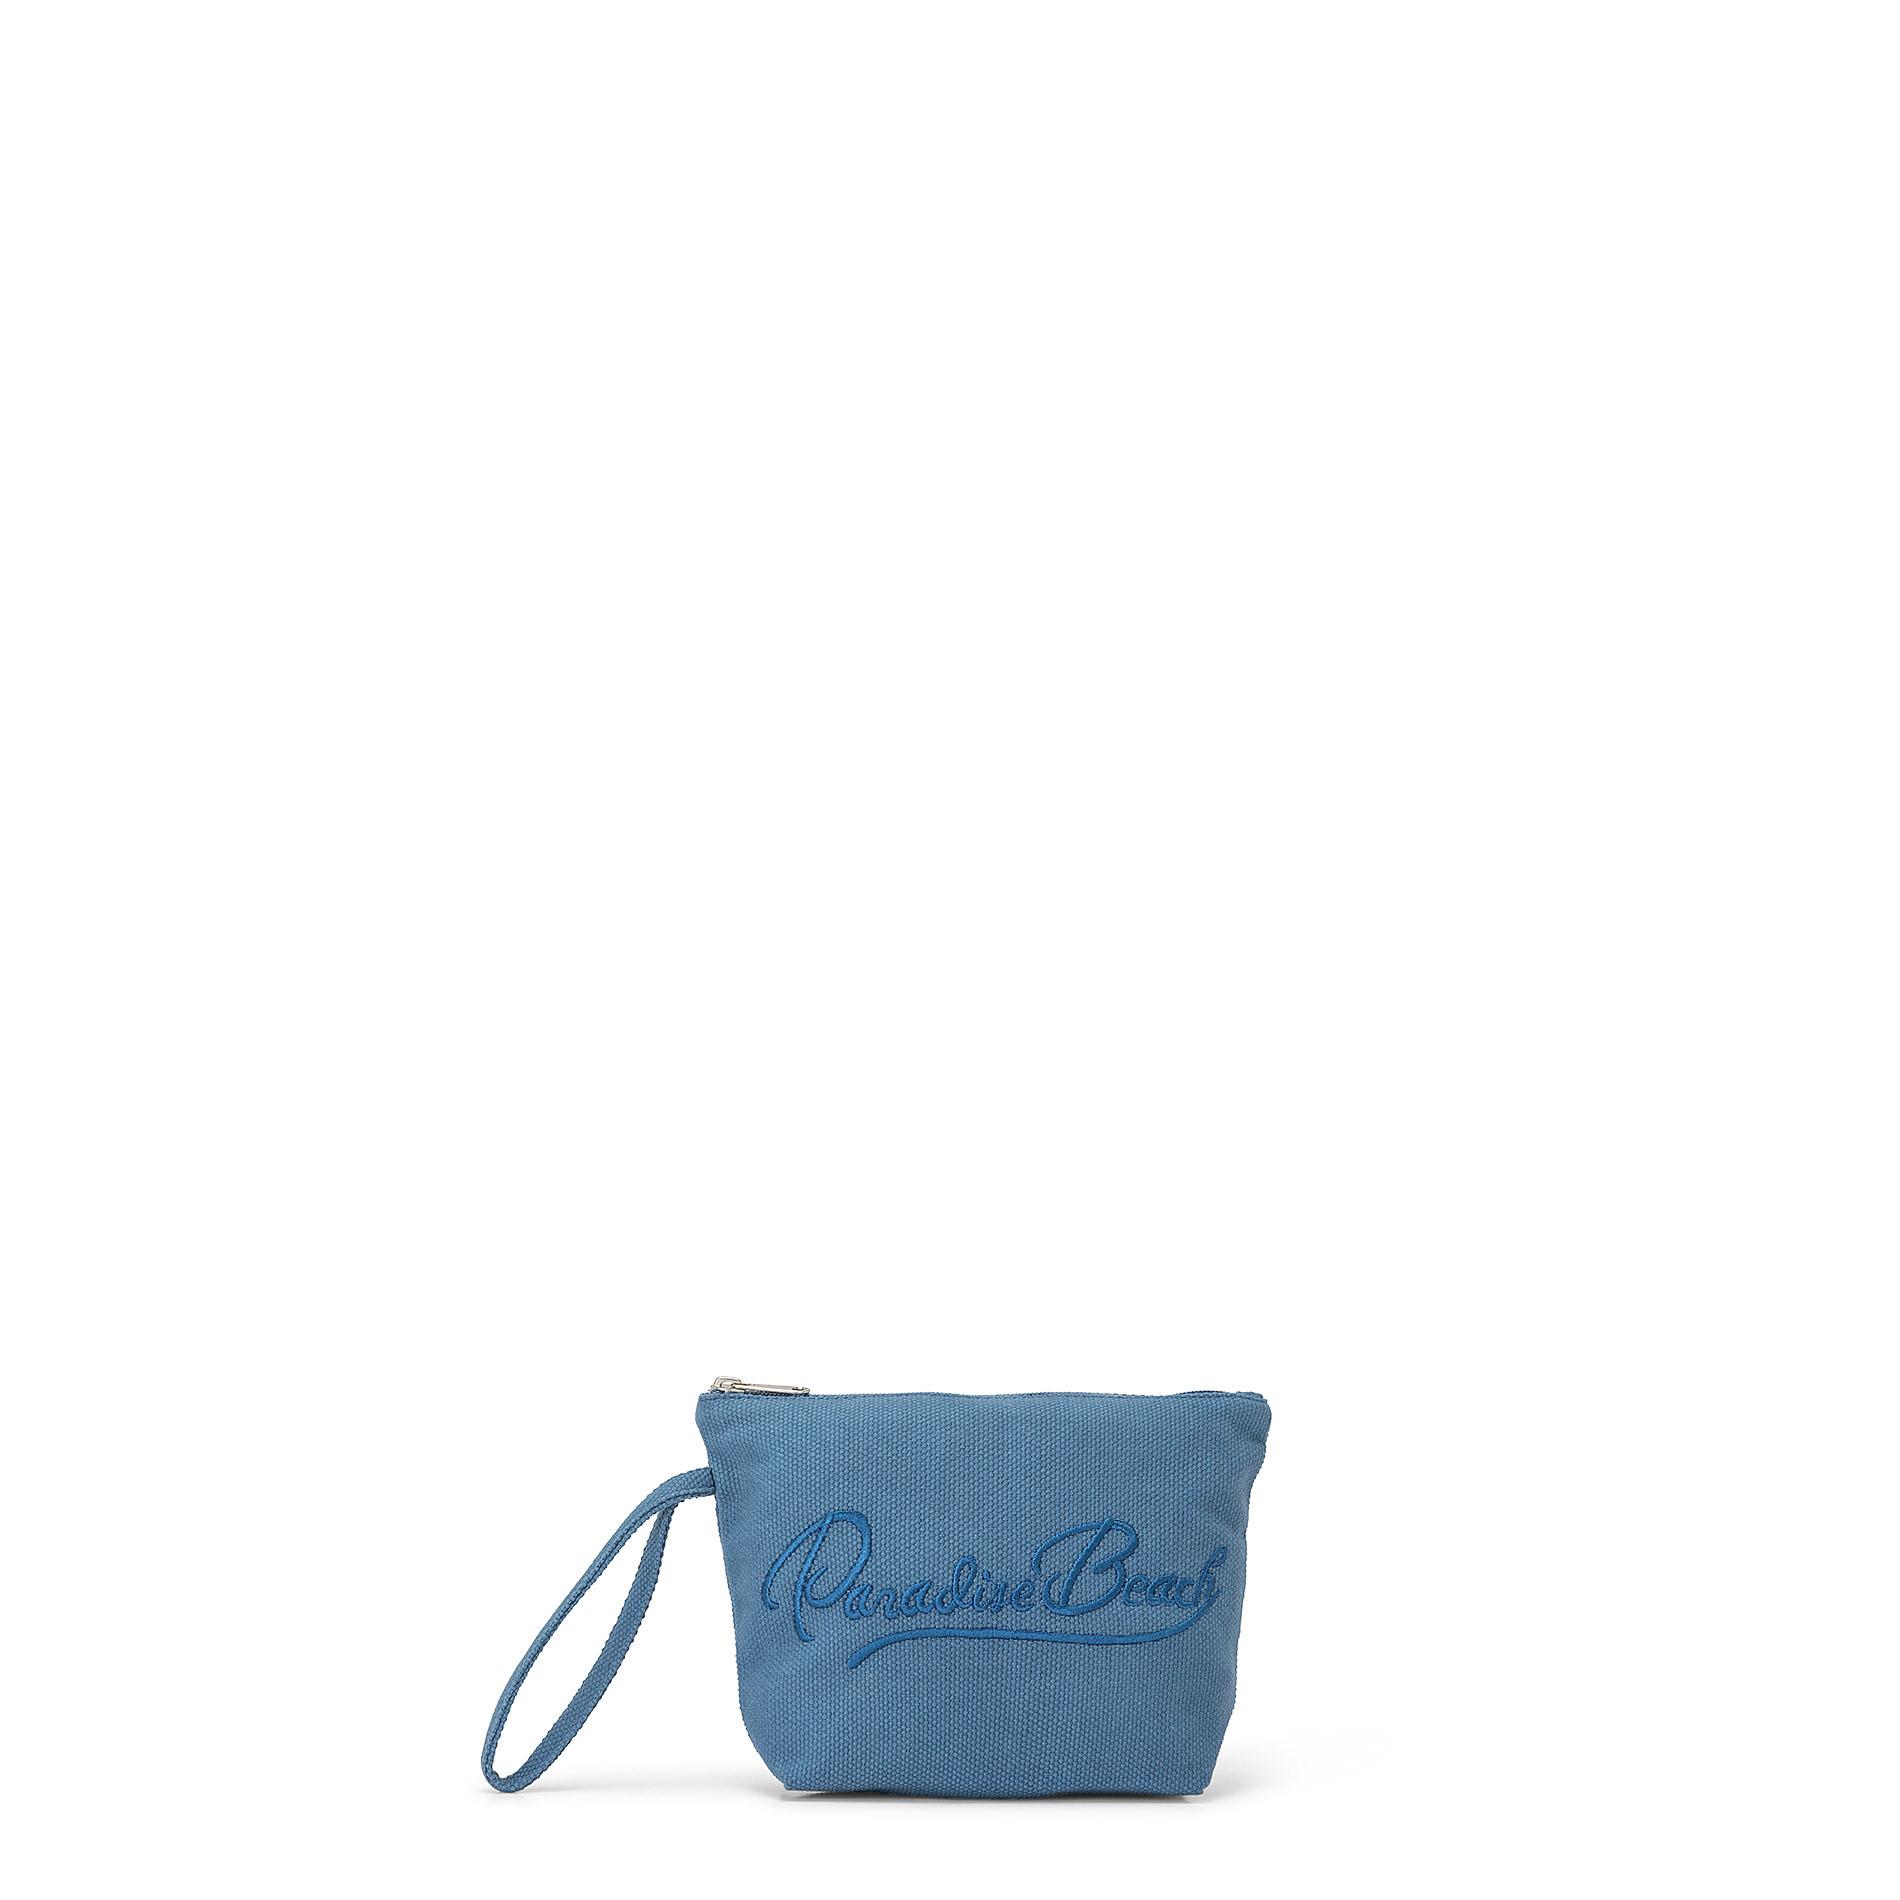 Bustina in canvas di cotone con ricamo, Blu, large image number 0